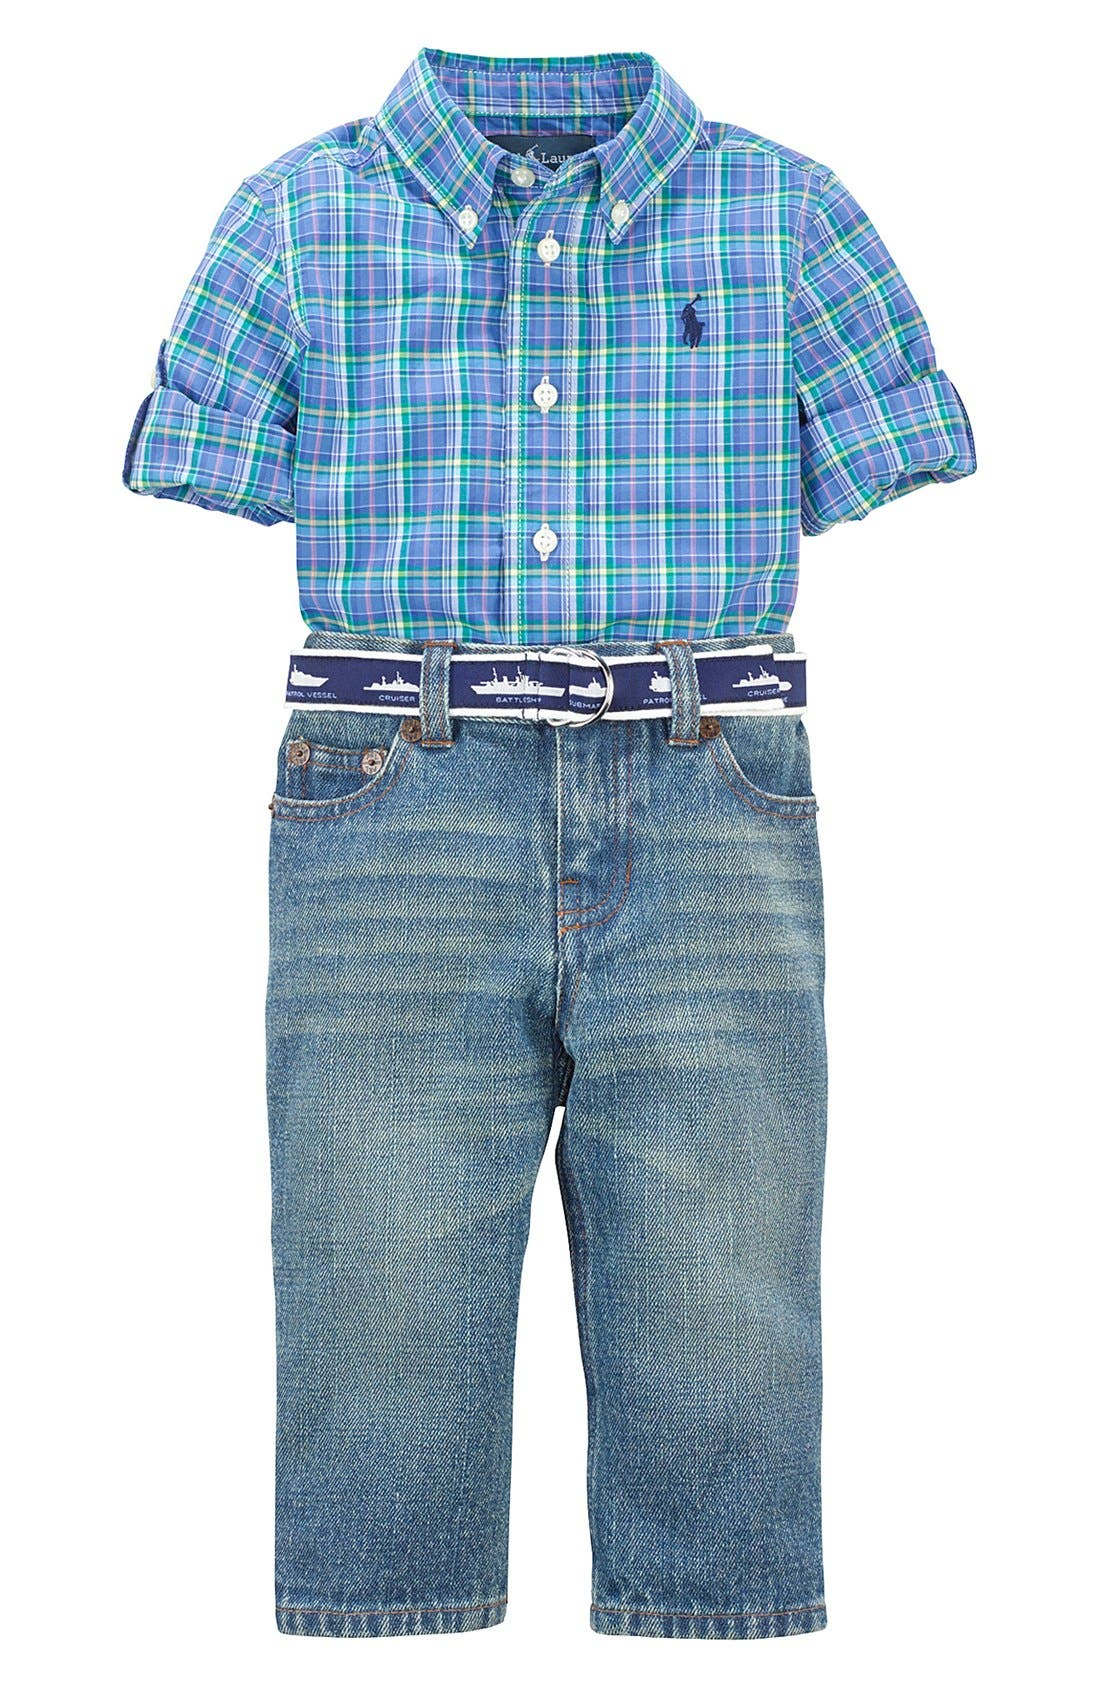 Alternate Image 1 Selected - Ralph Lauren Plaid Sport Shirt & Jeans (Baby Boys)